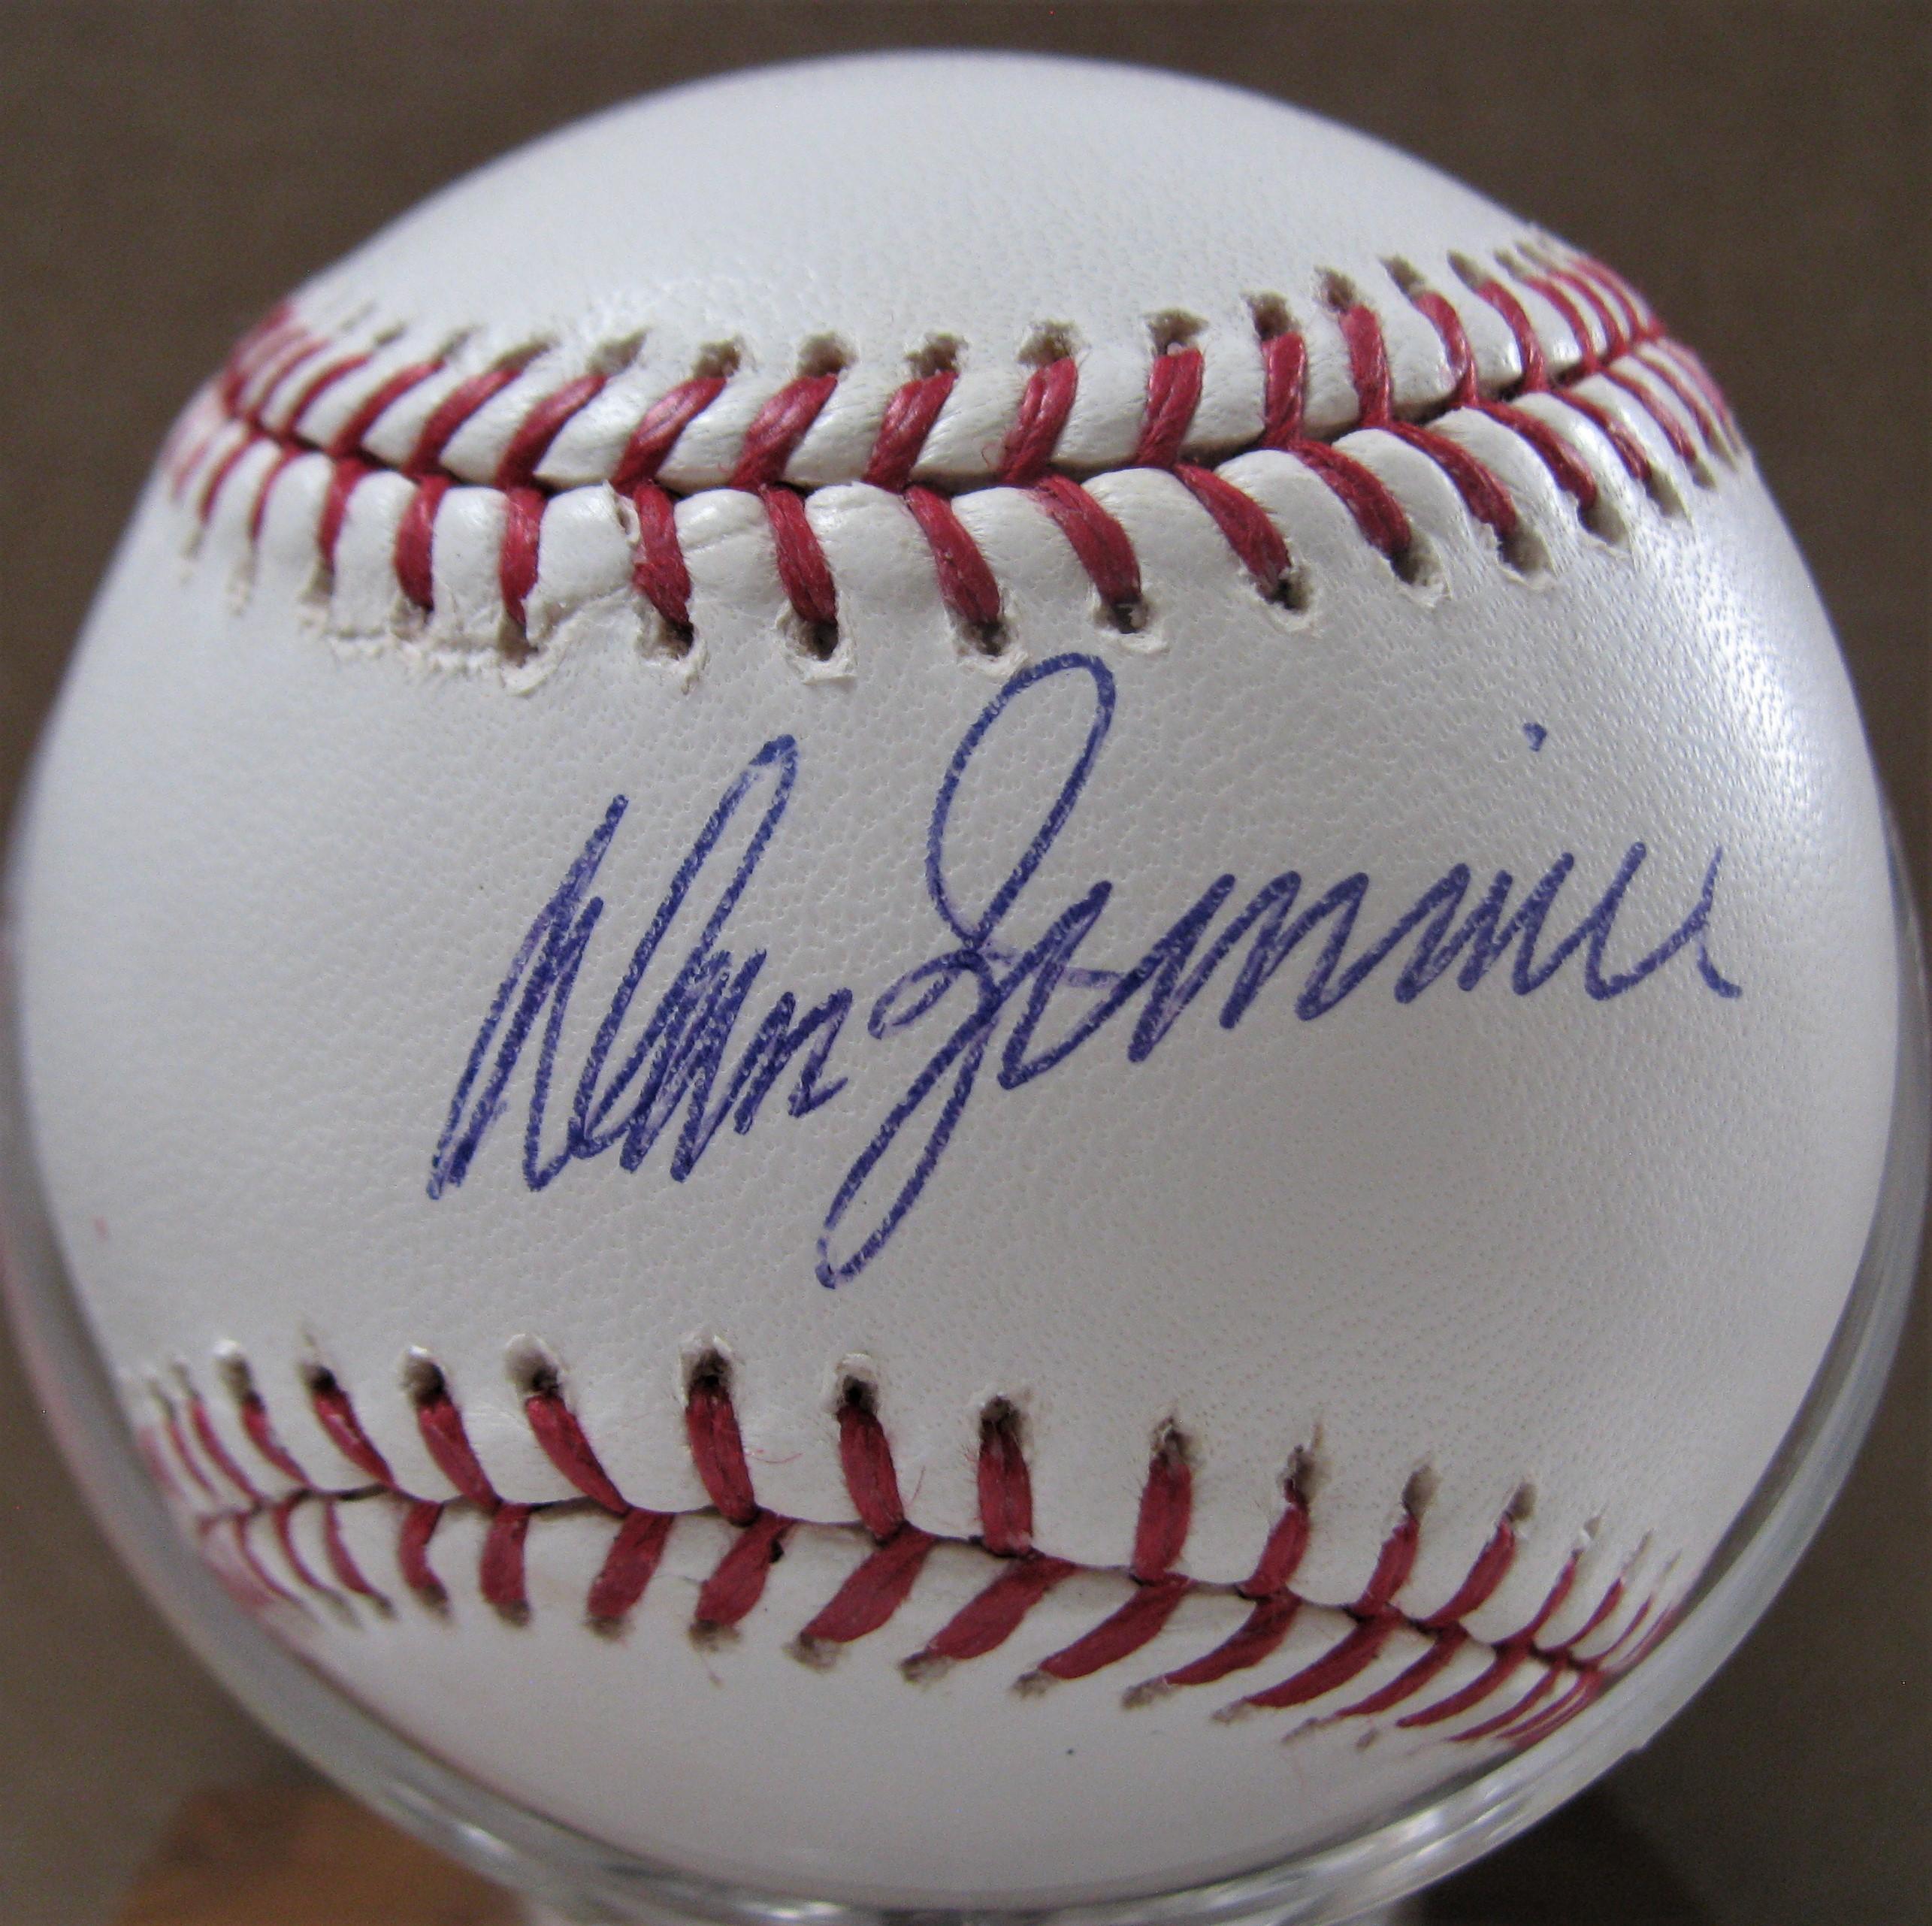 Don Zimmer Autographed Baseball Autographs-original